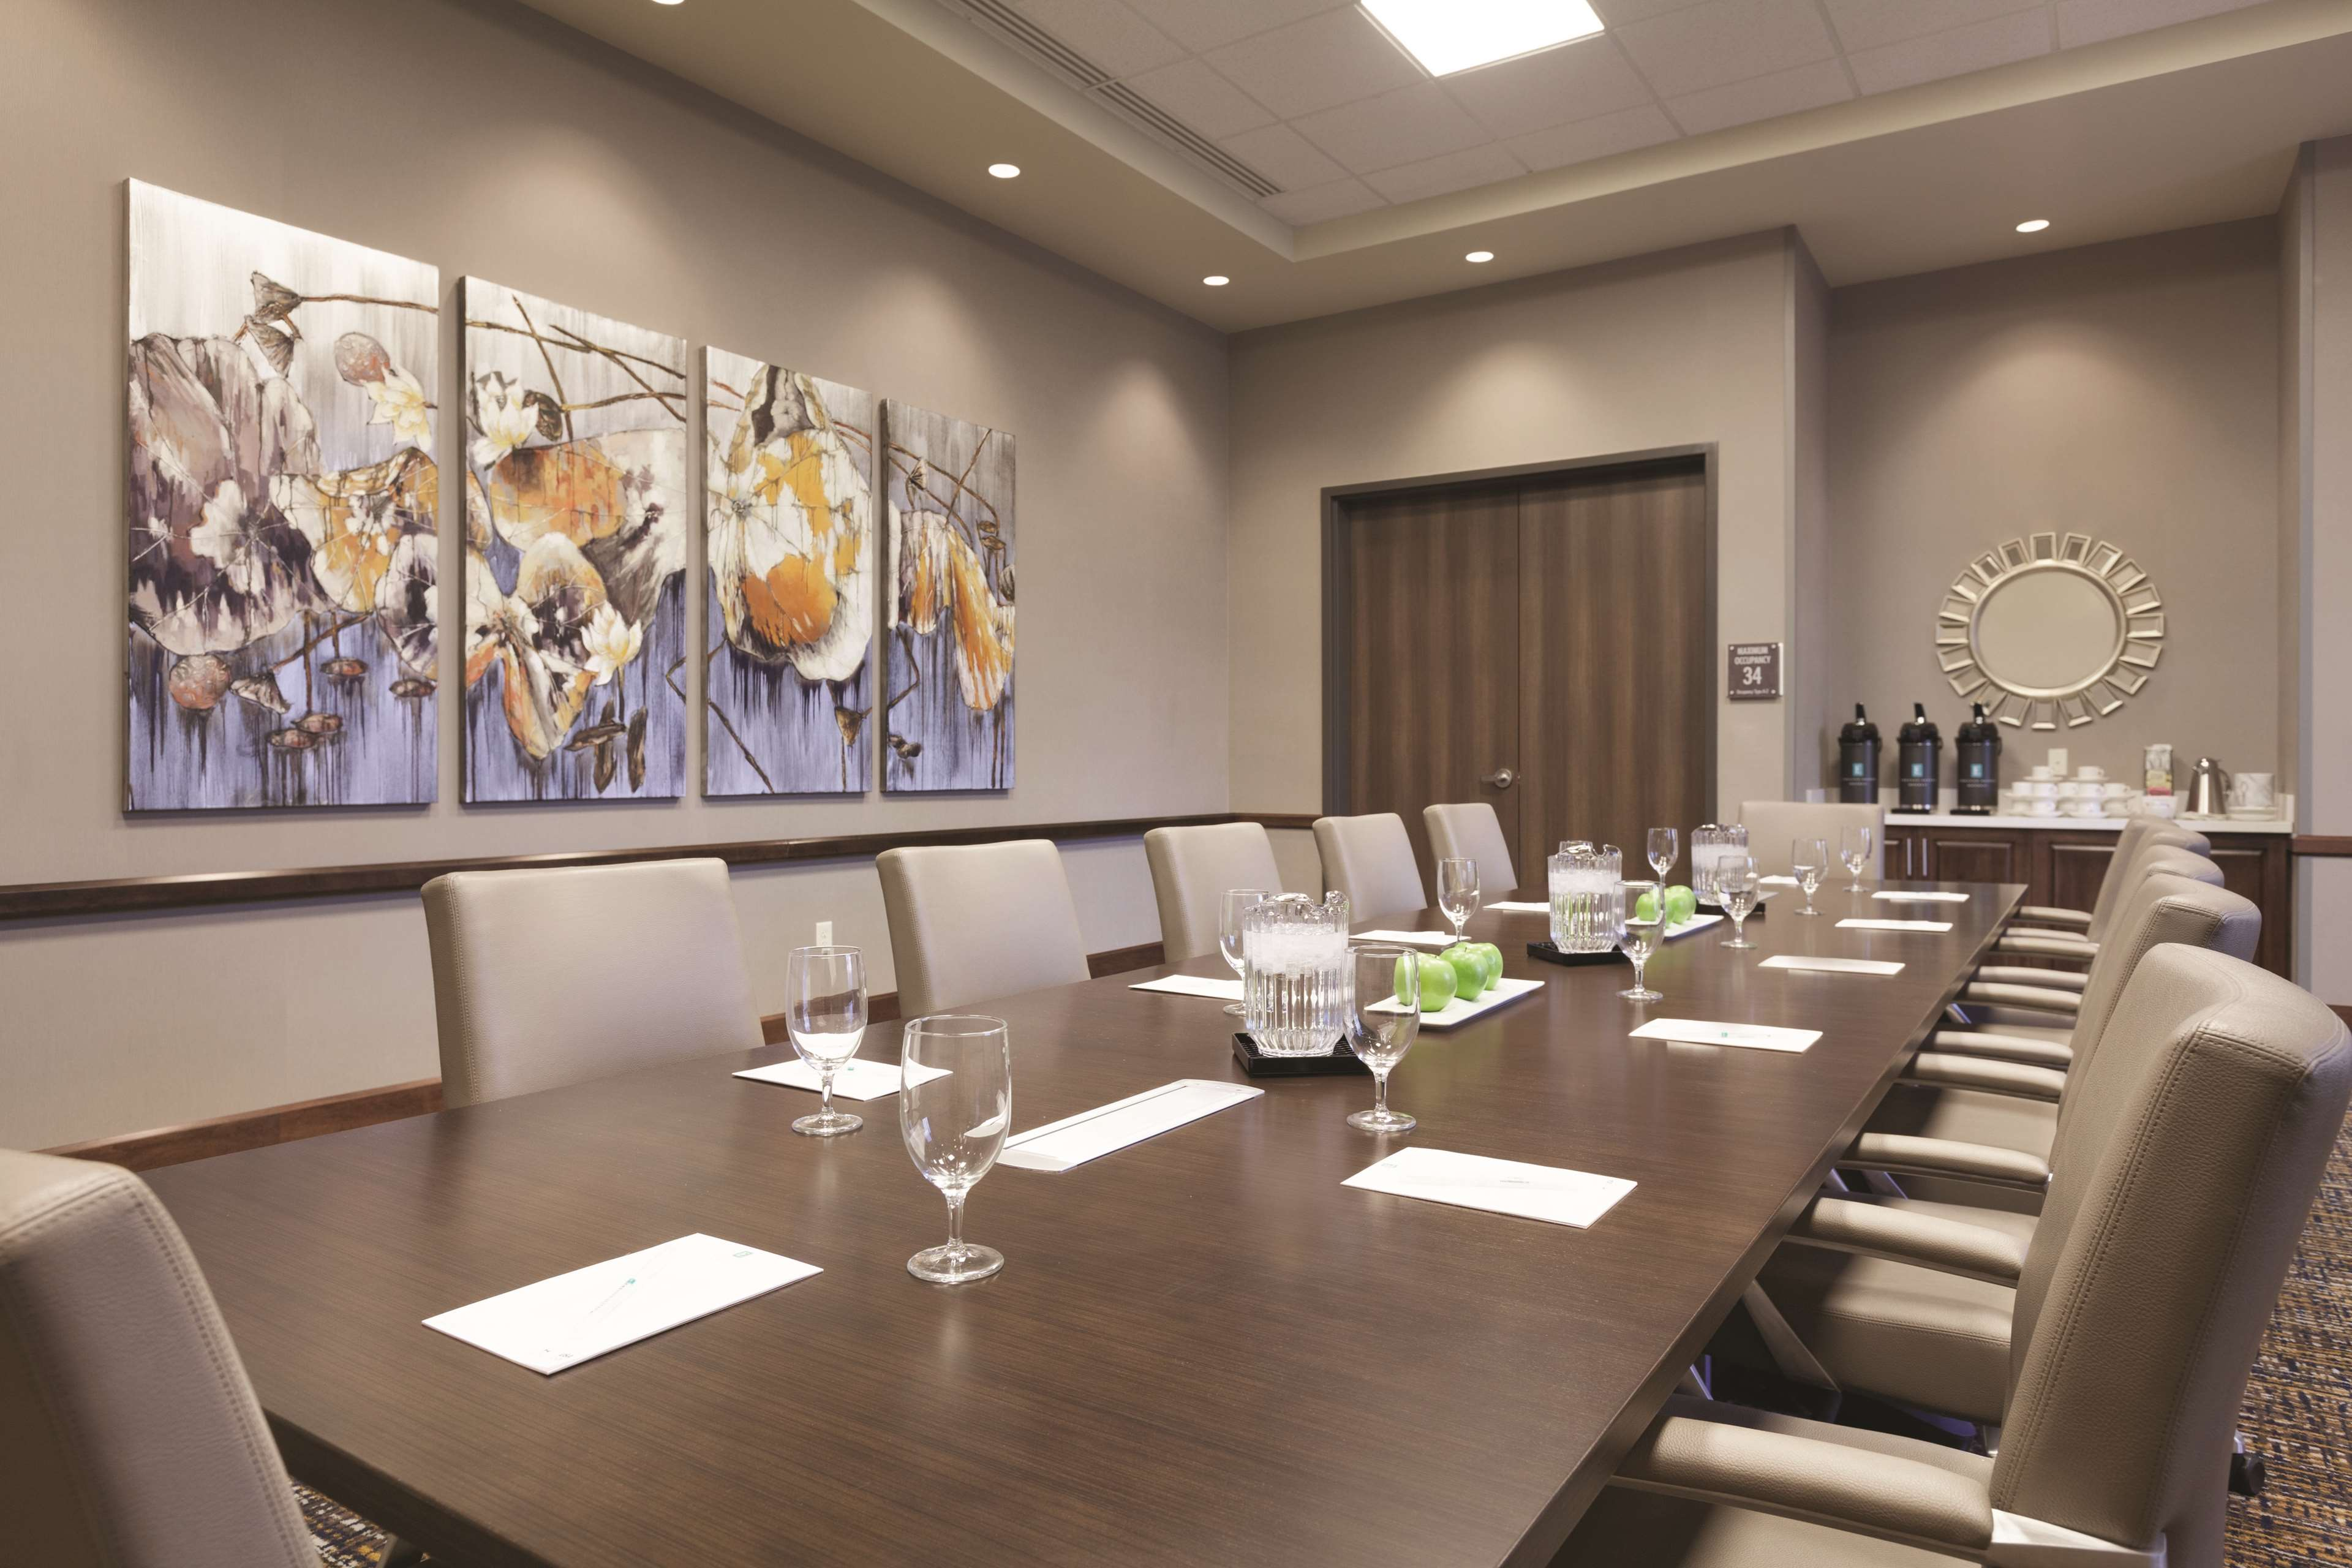 Embassy Suites by Hilton Portland Hillsboro, Oregon image 30